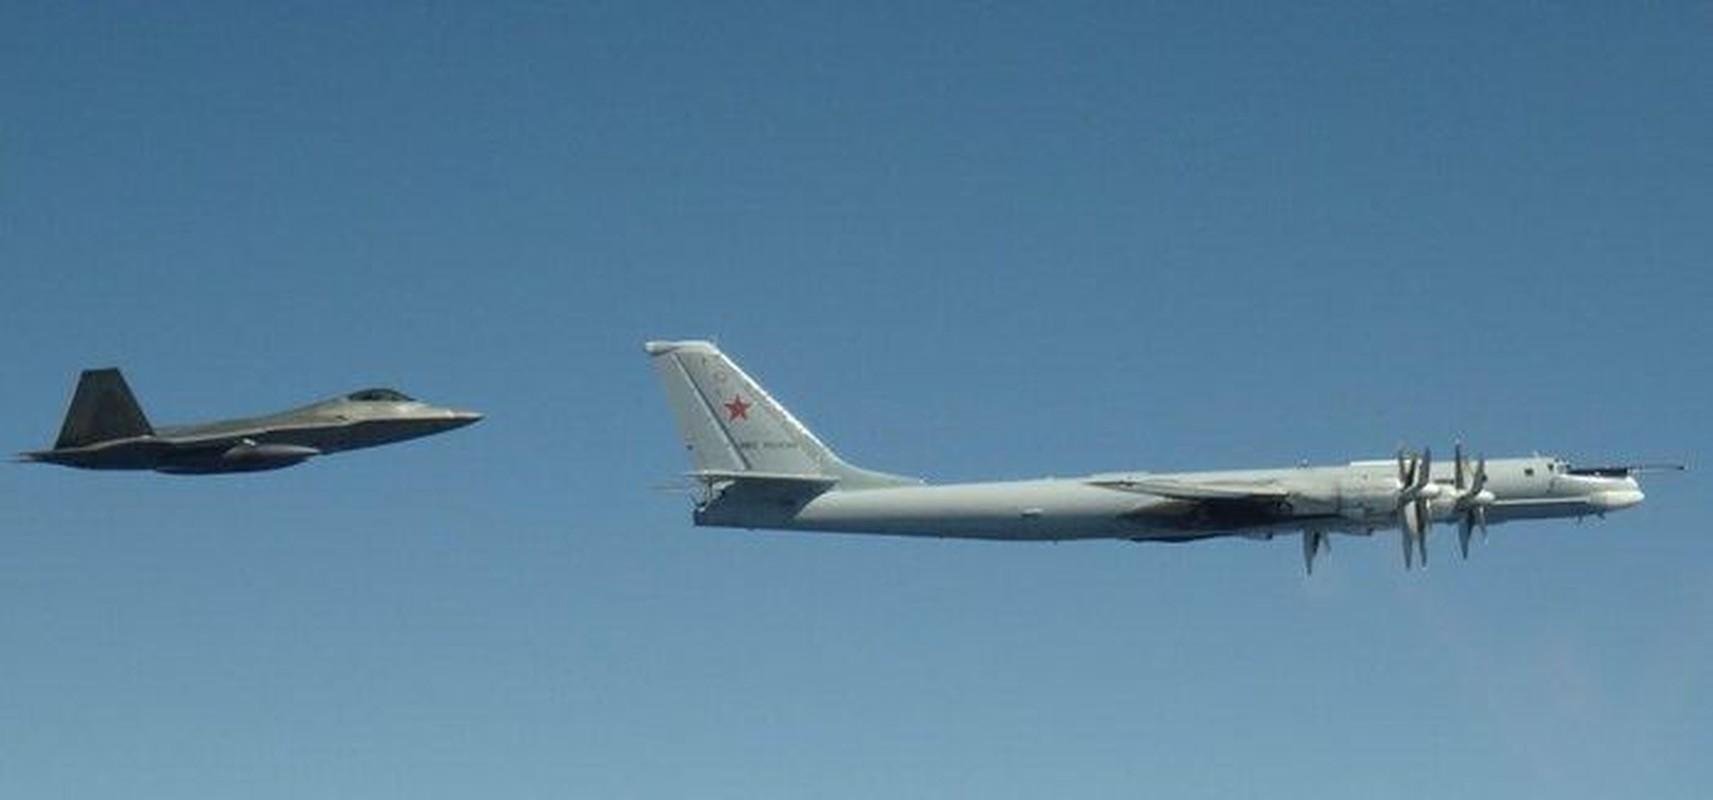 Cach Nga dung may bay doi cu hanh ha F-22 Raptor dat do My-Hinh-7